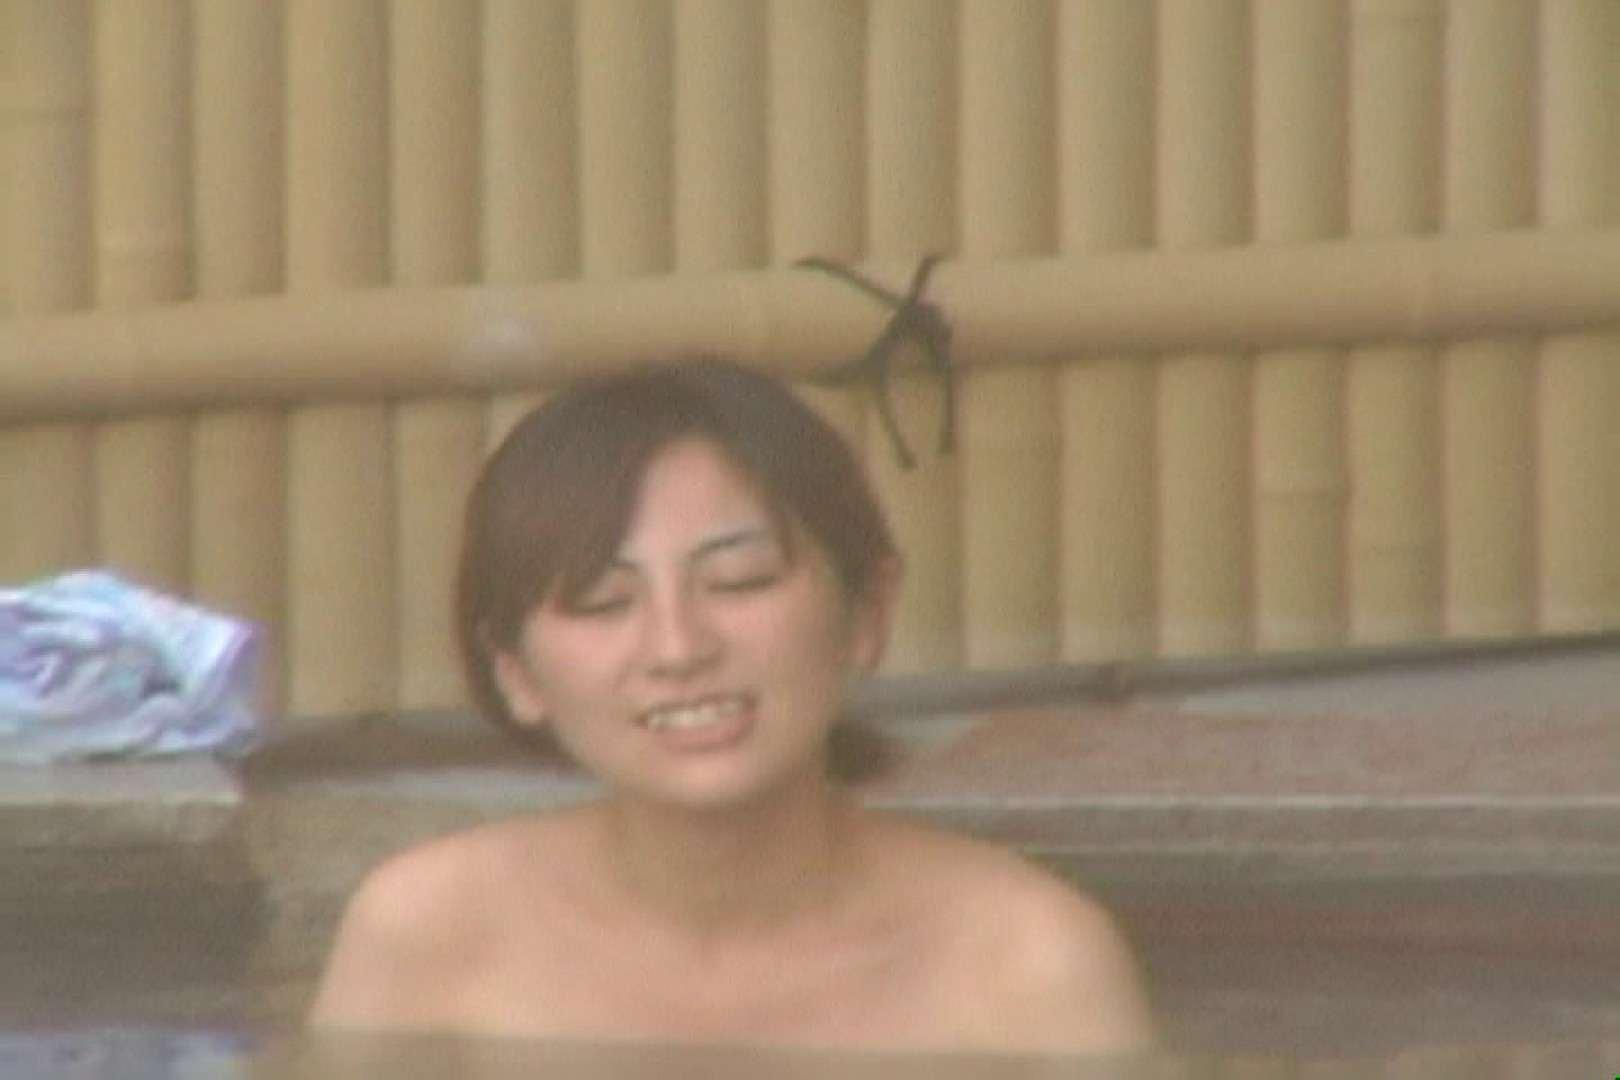 Aquaな露天風呂Vol.26【VIP】 OLセックス 盗み撮りオマンコ動画キャプチャ 59画像 26